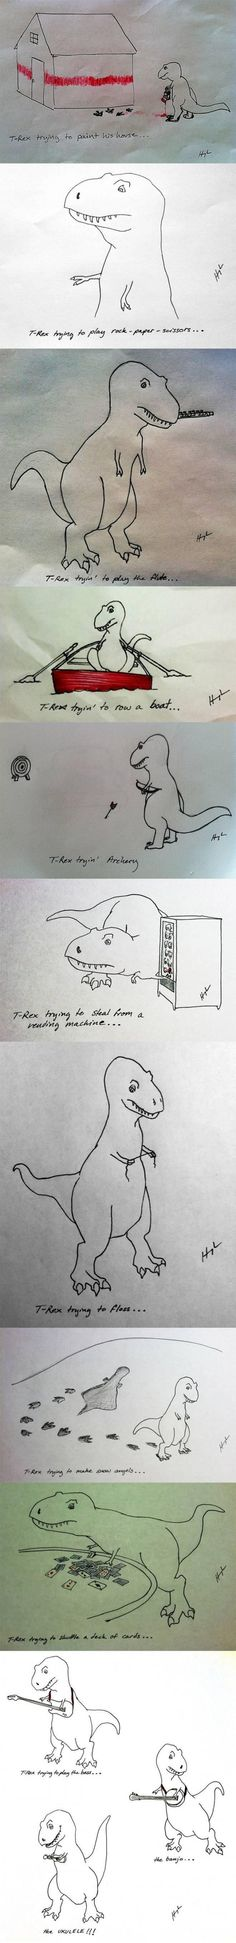 T. Rex: Das Leben ist hart